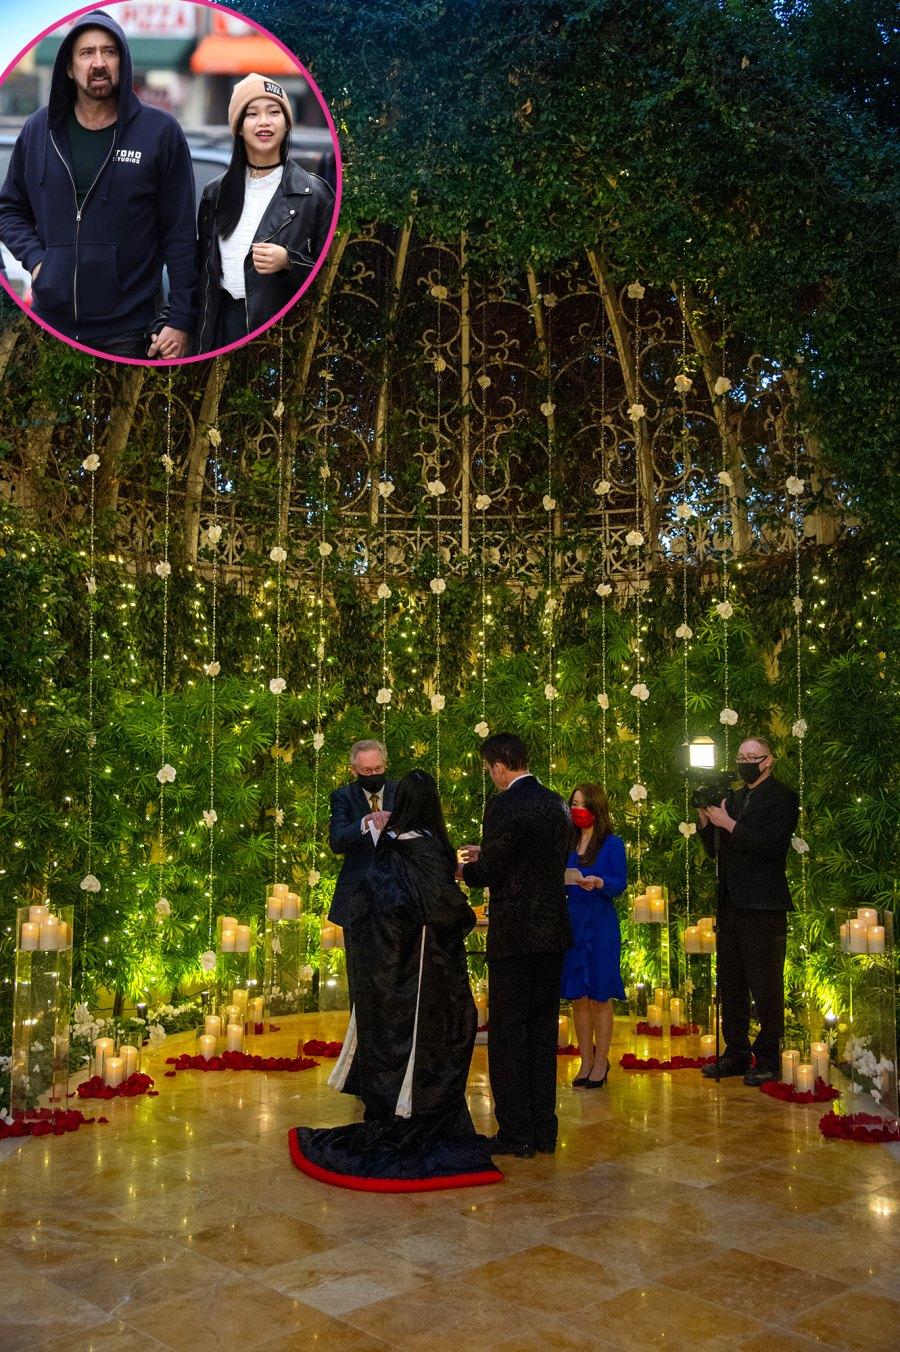 Nicolas Cage Riko Shibata Celebrity Weddings of 2021